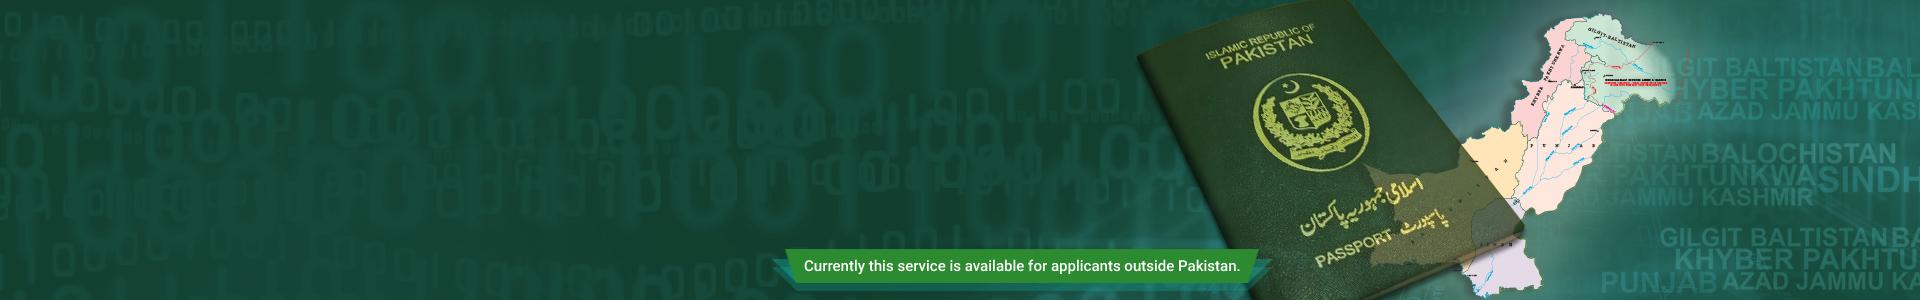 Pakistani Passport Renew Online passport,online,renewal,abroad,Pakistan